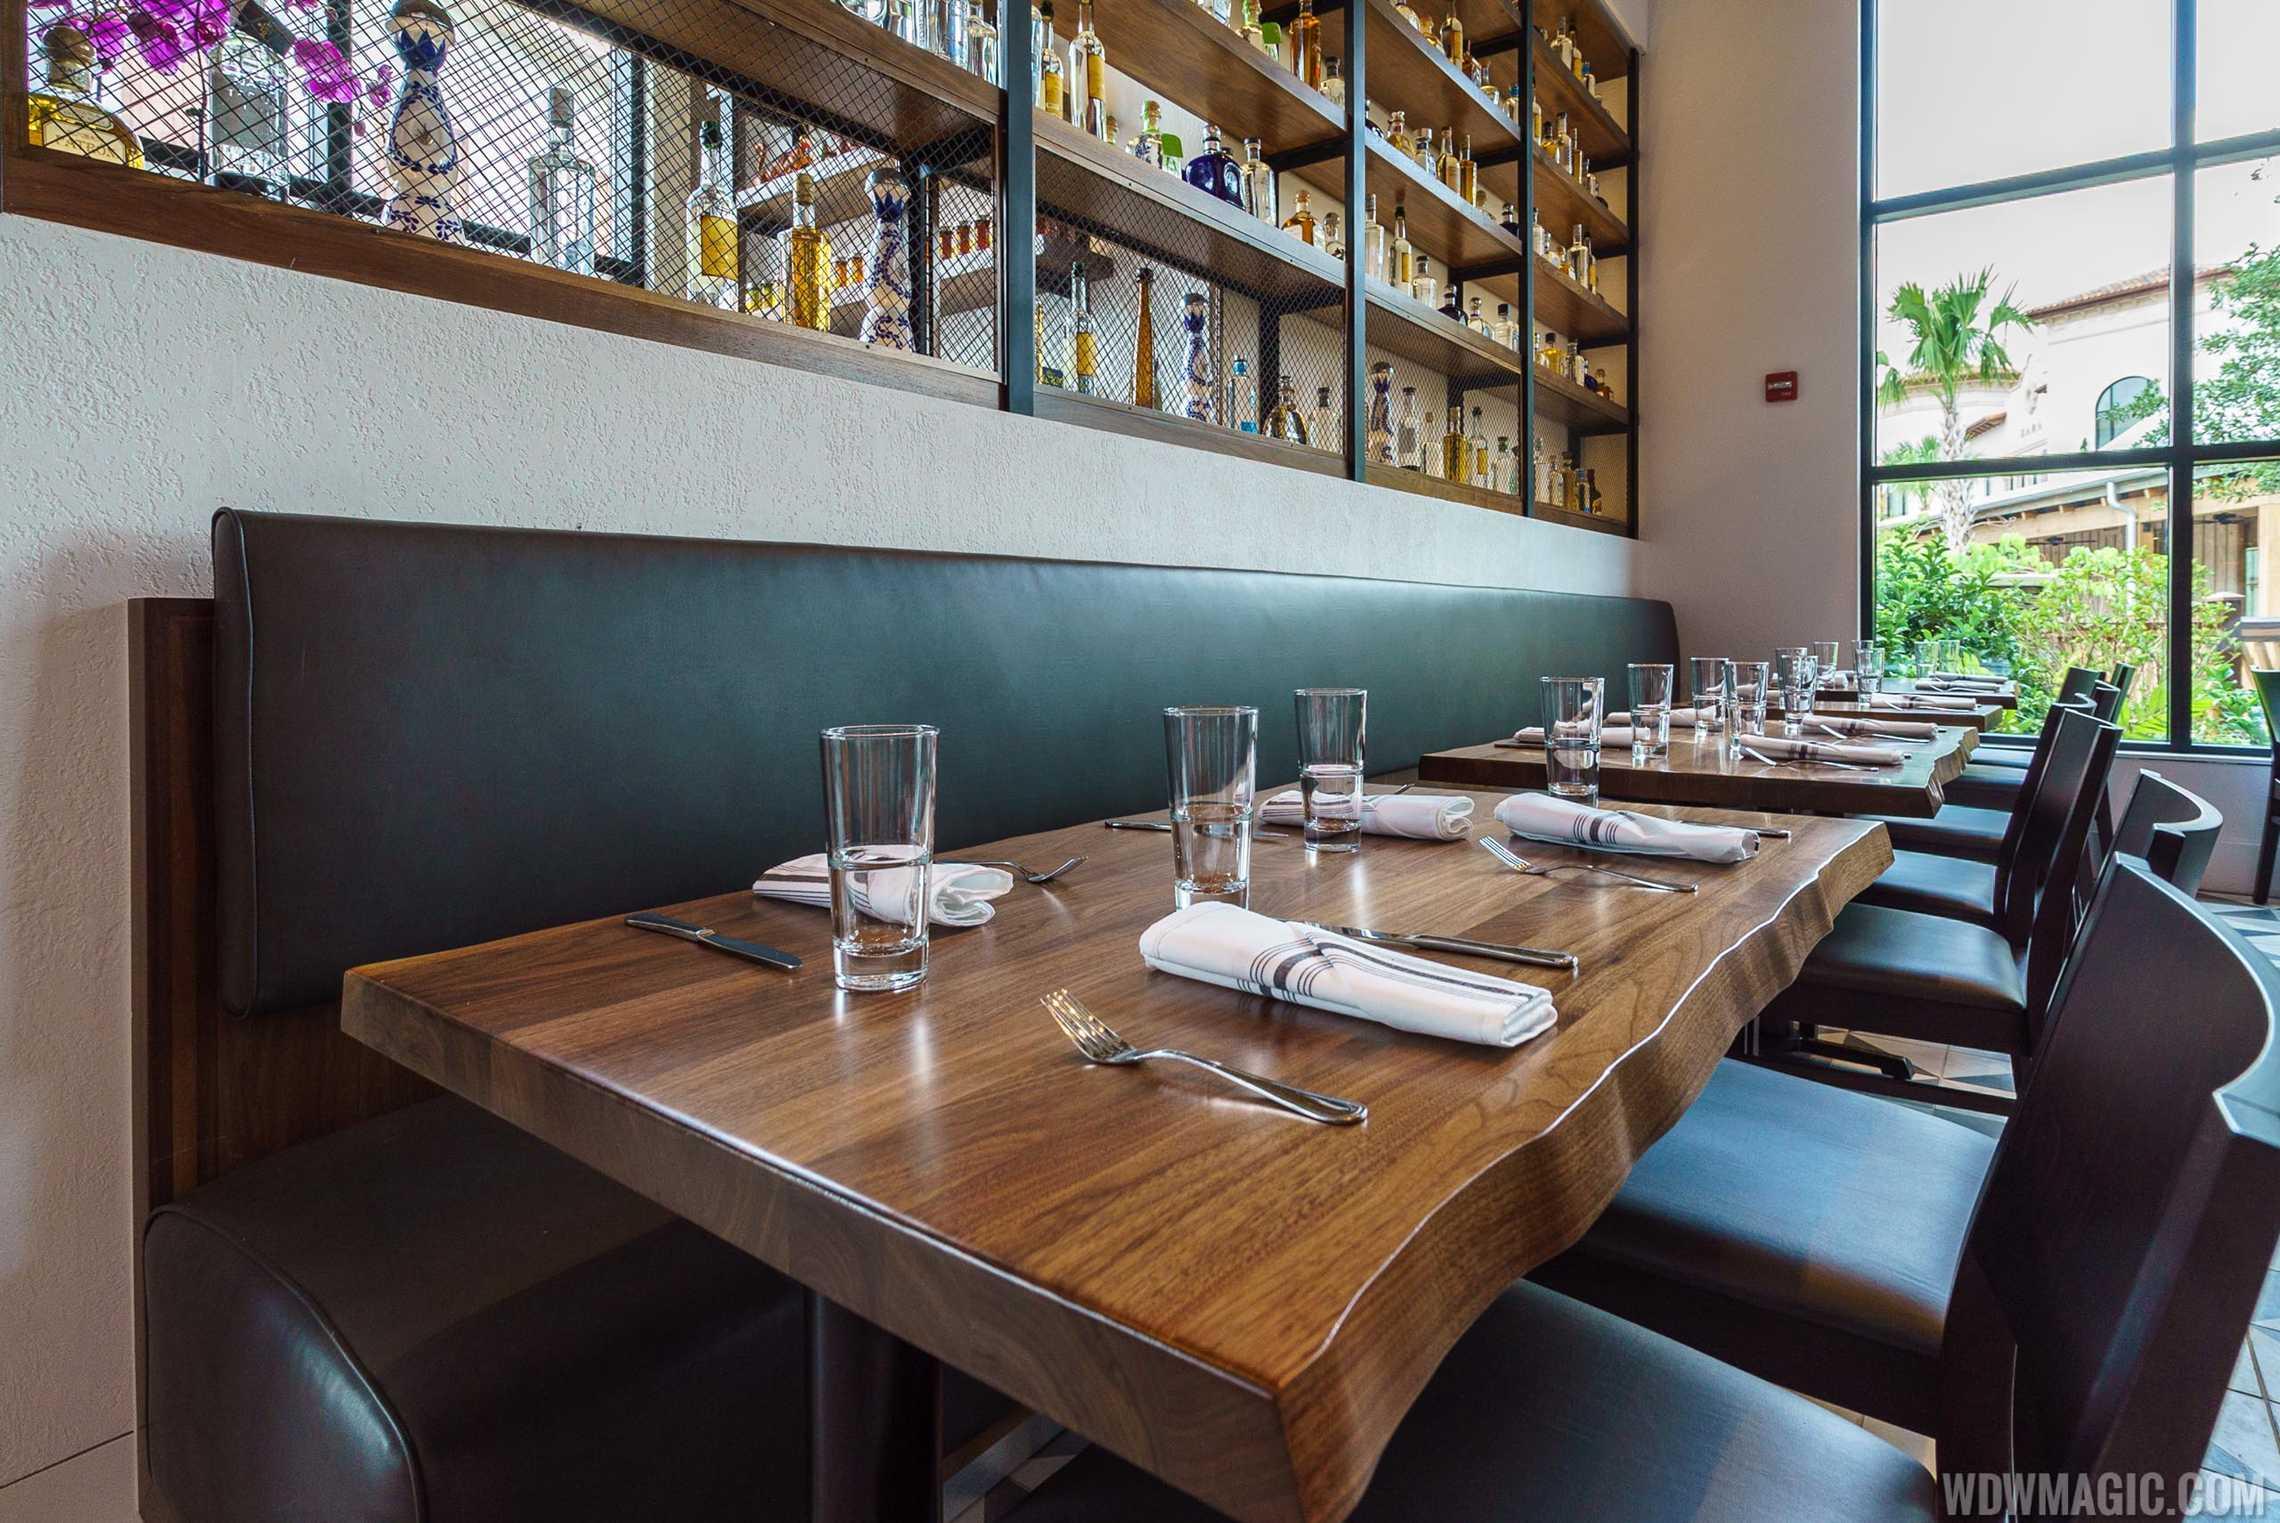 Frontera Cocina - Tables